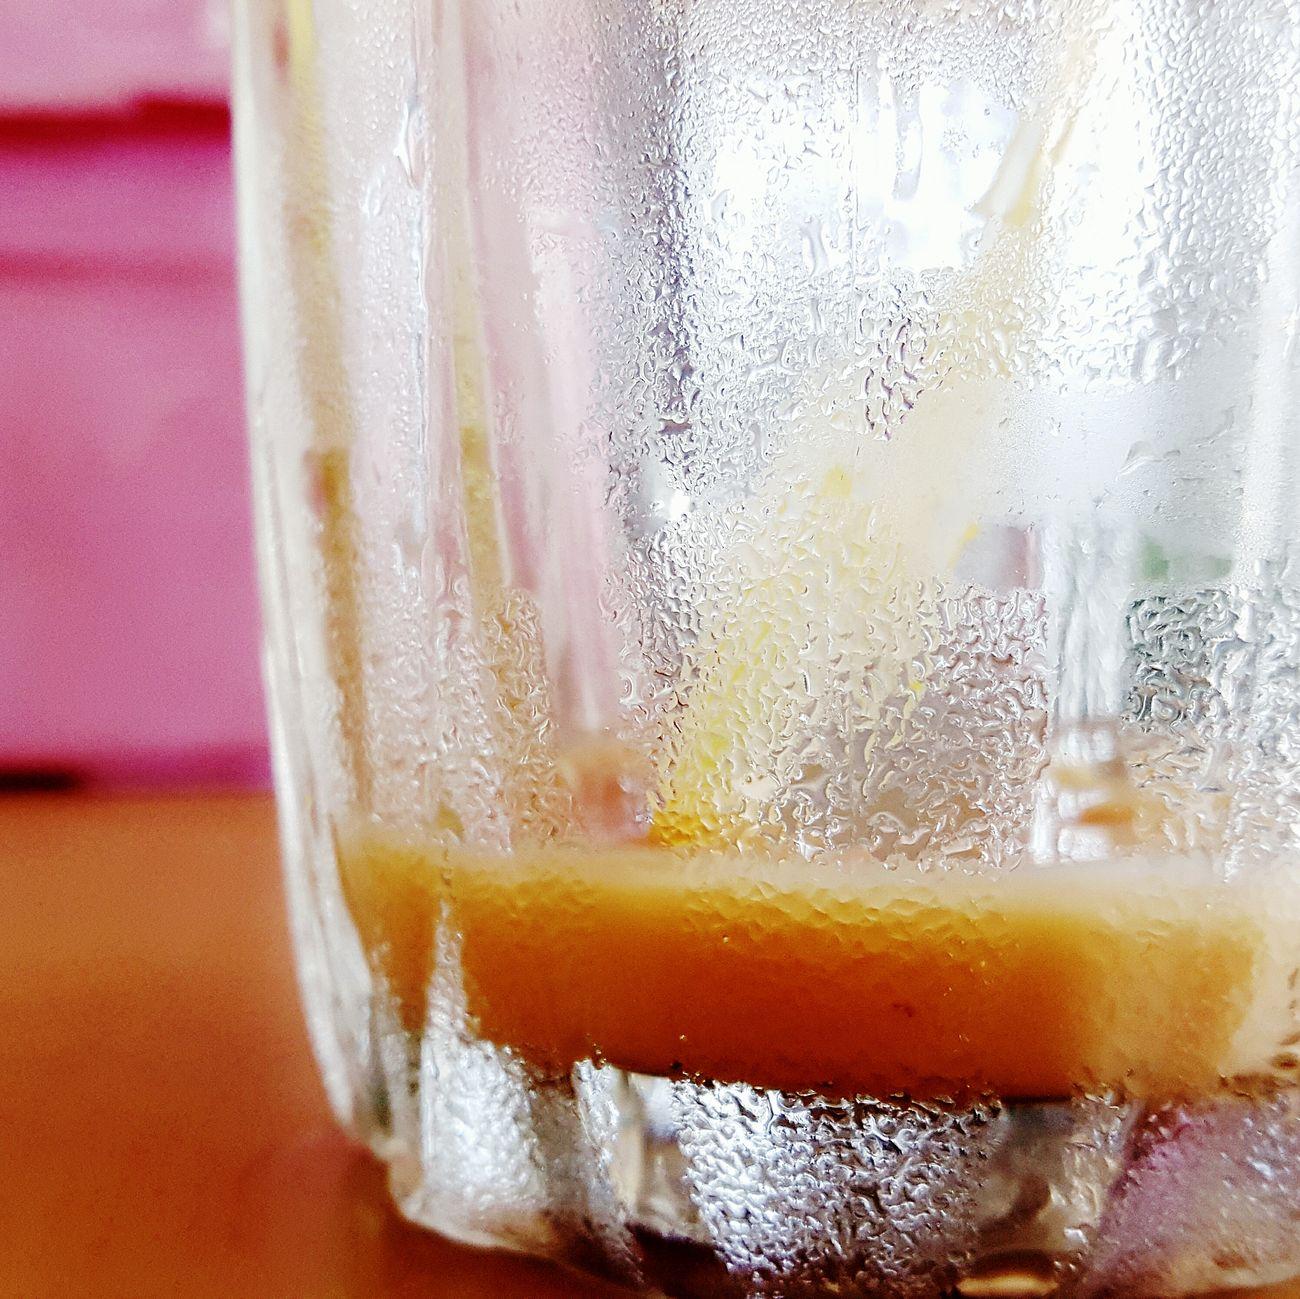 Every Malaysian's favorite drink. Teh C Ping (Milk Tea) Hello World Sabah Kota Kinabalu Malaysia Amateurphotography Randomshot EyeEm Malaysia Condensation